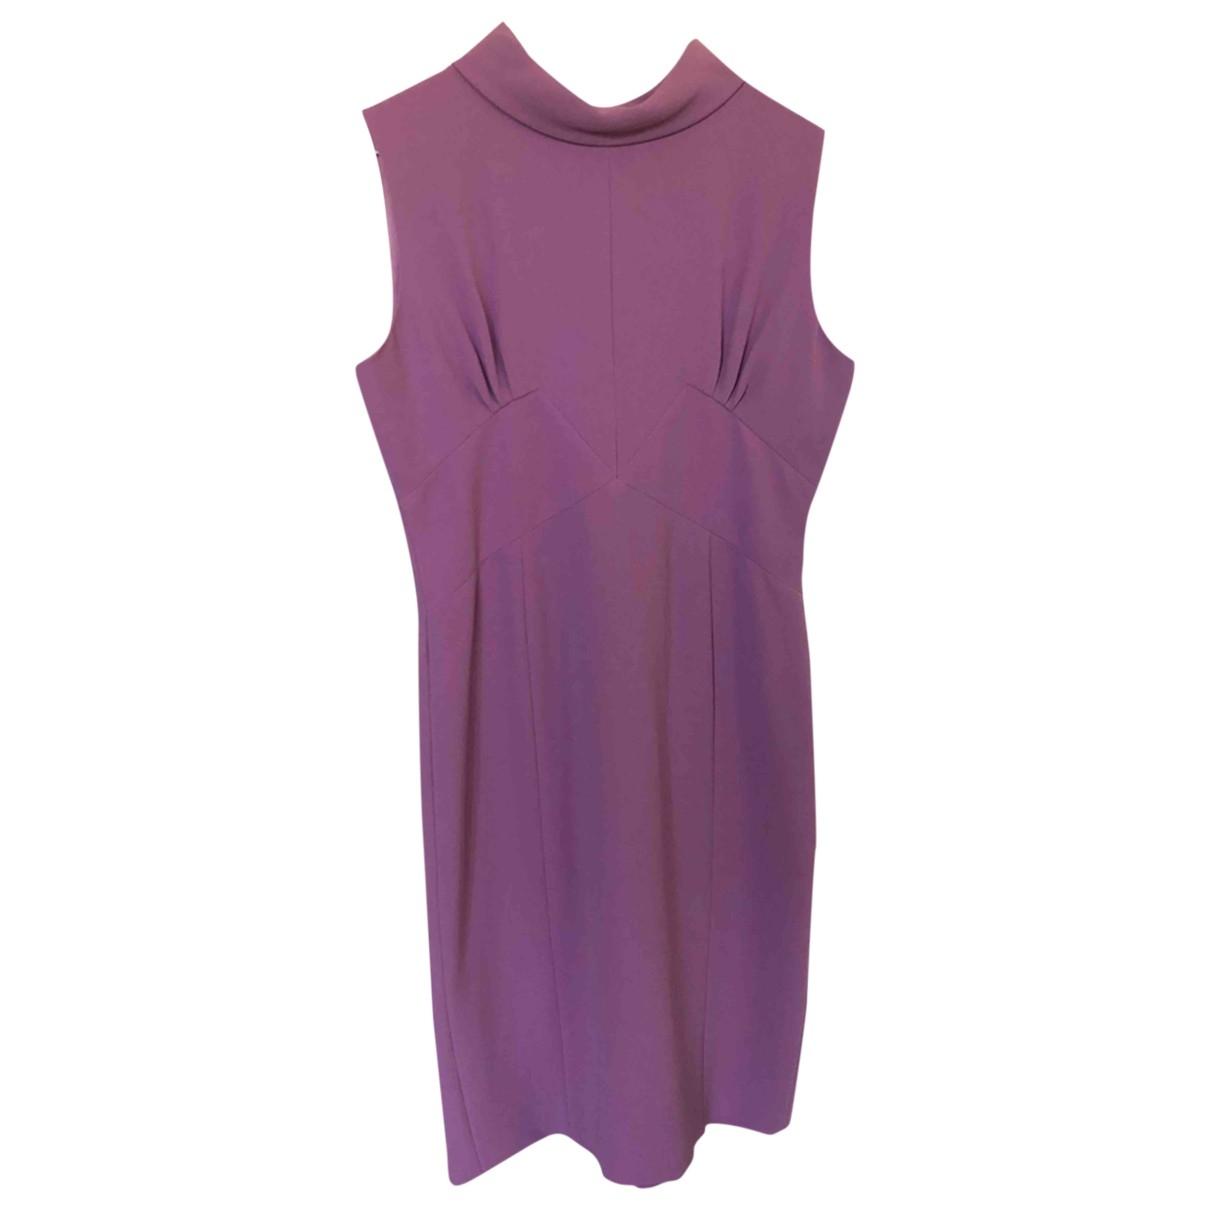 Bottega Veneta \N Purple dress for Women 44 IT